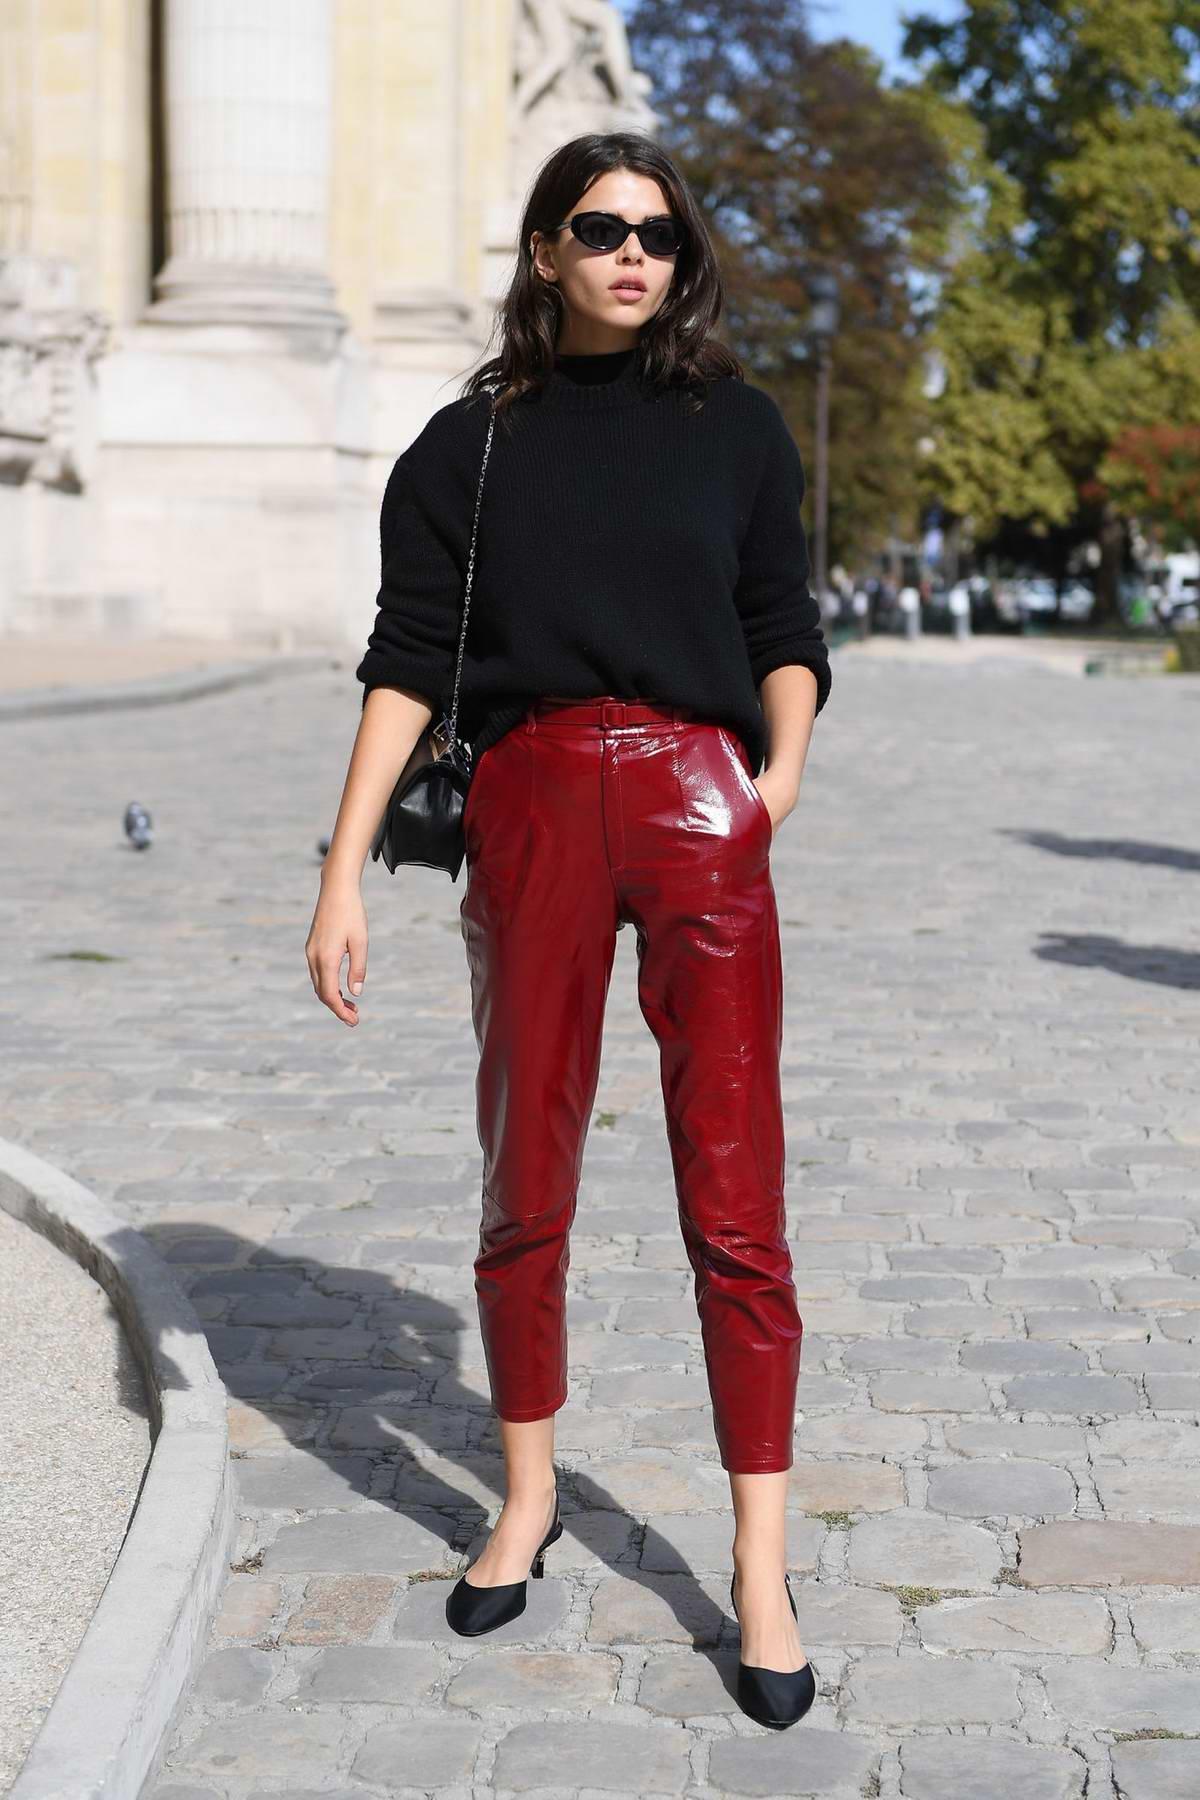 Georgia Fowler attends the Elie Saab Show during Paris Fashion Week in Paris, France